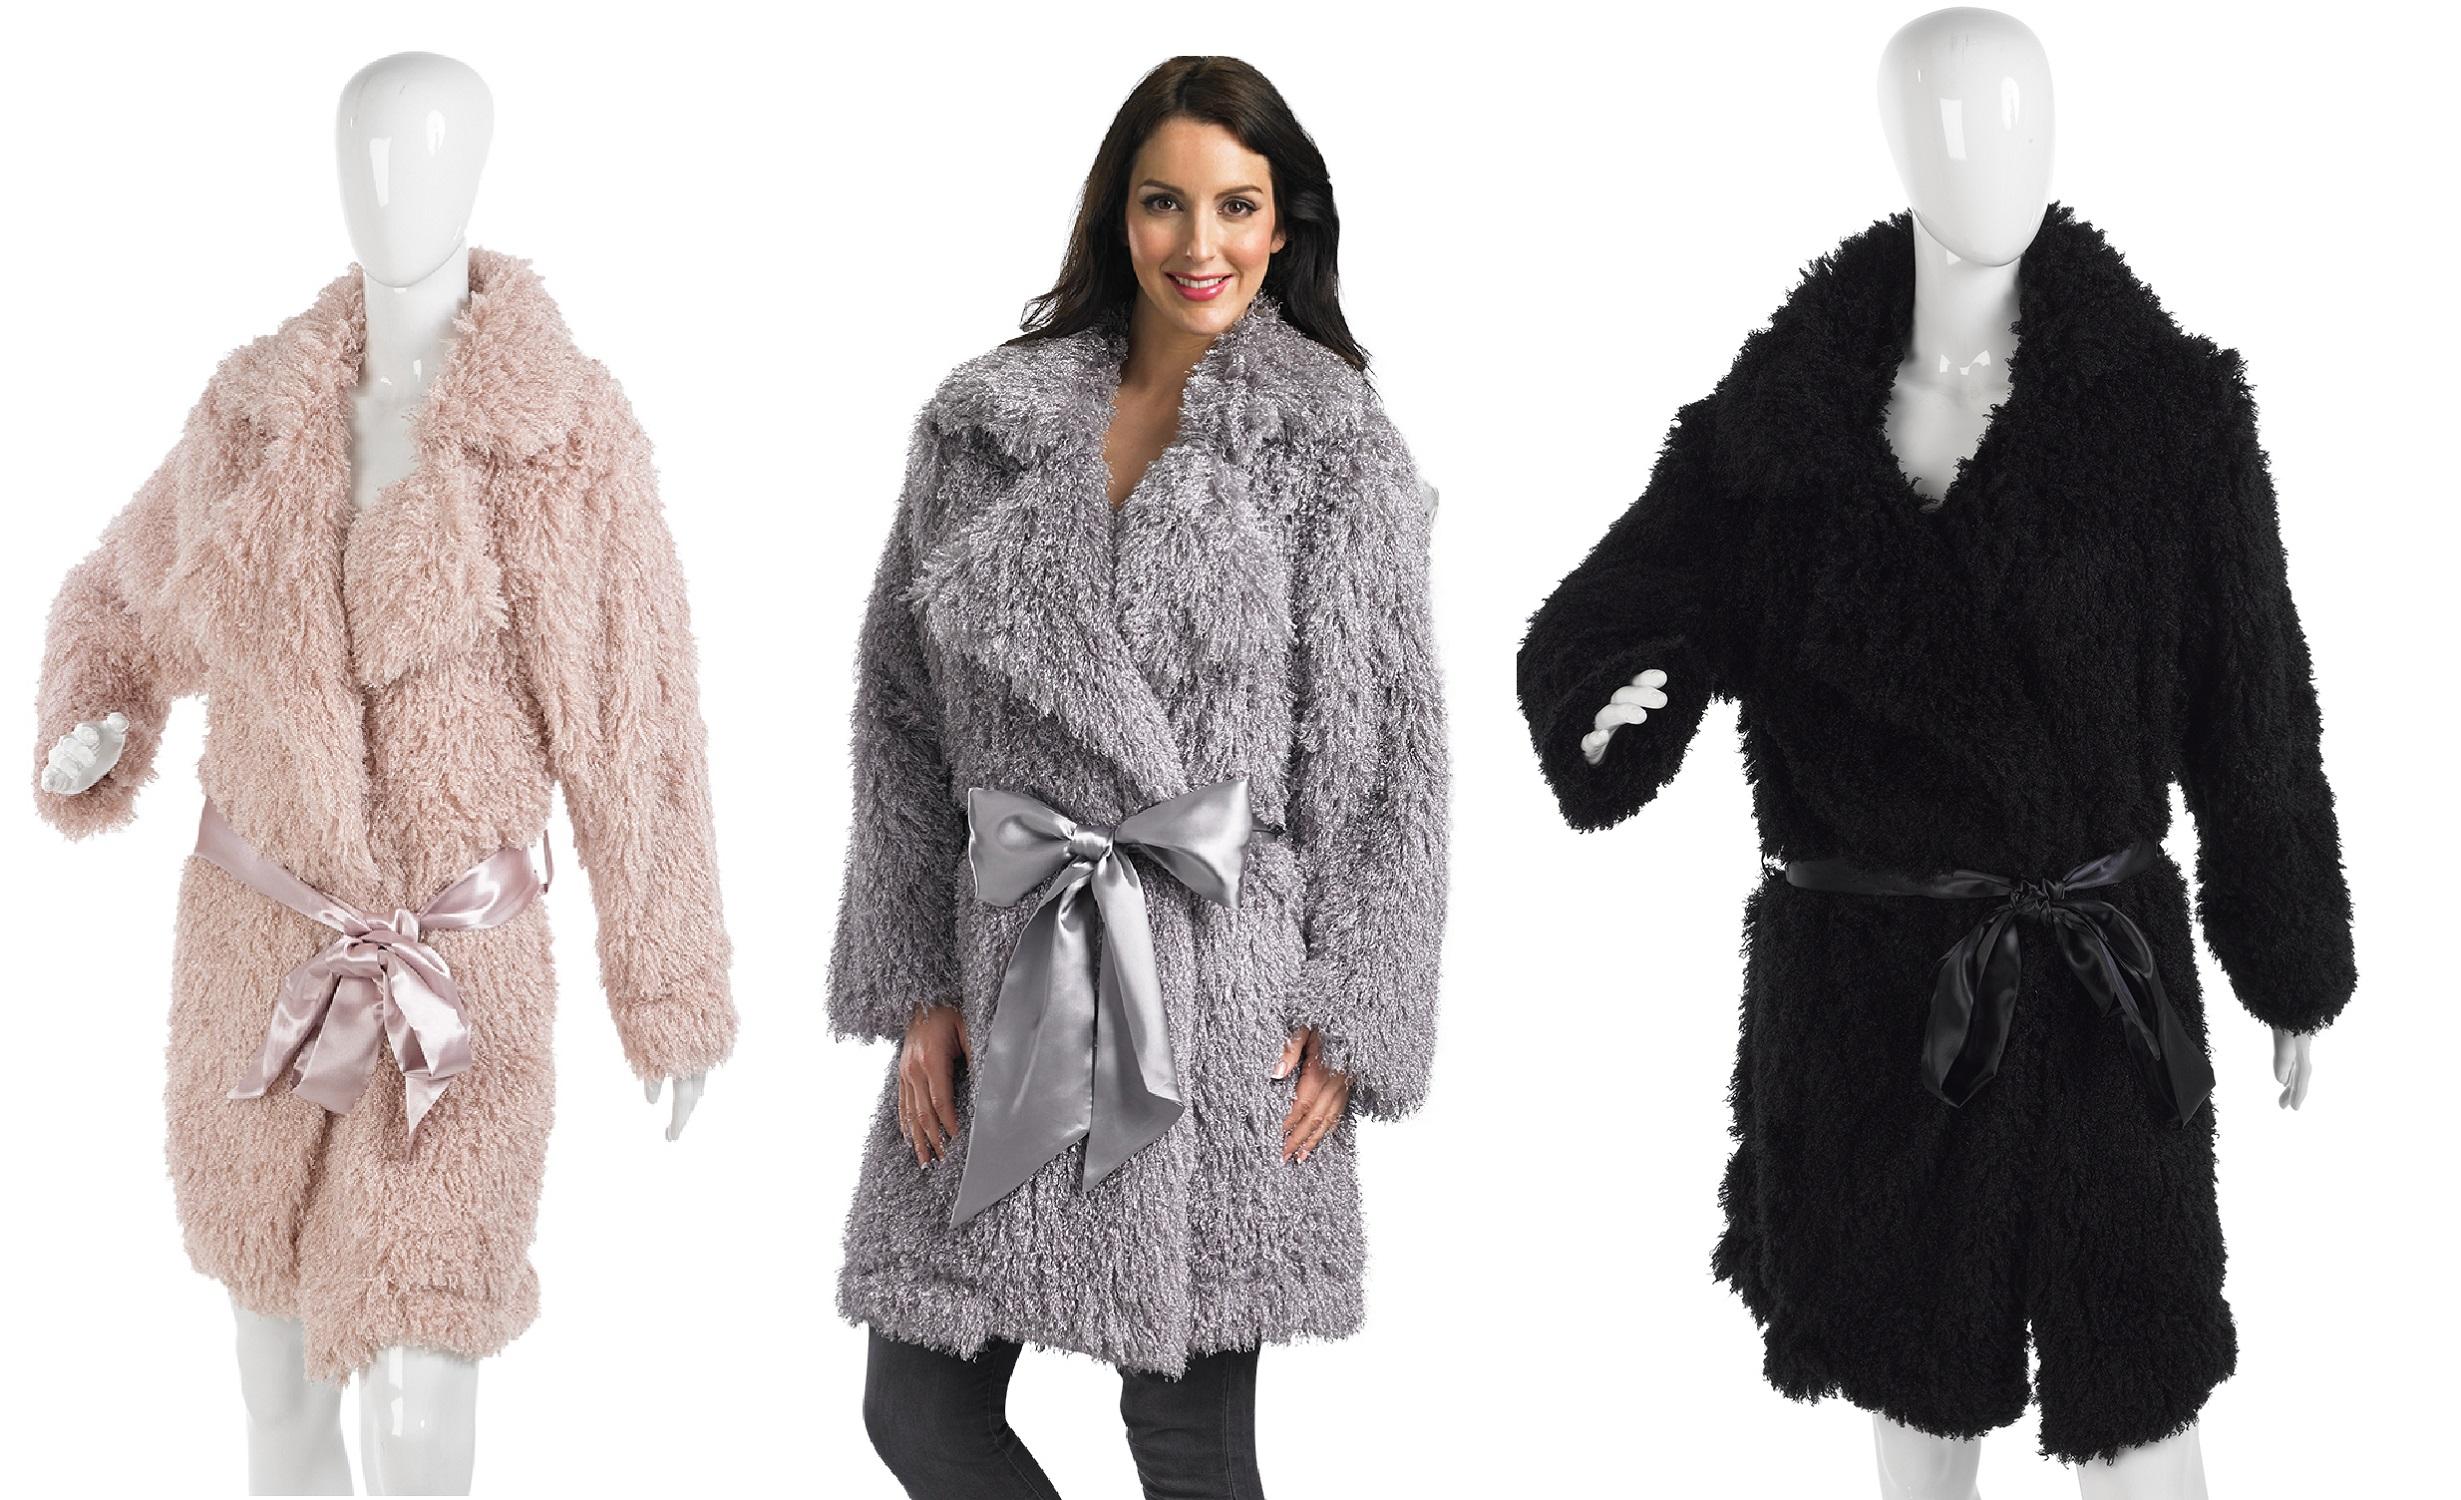 Luxury Dressing Gowns Ladies Uk - Home Decorating Ideas & Interior ...